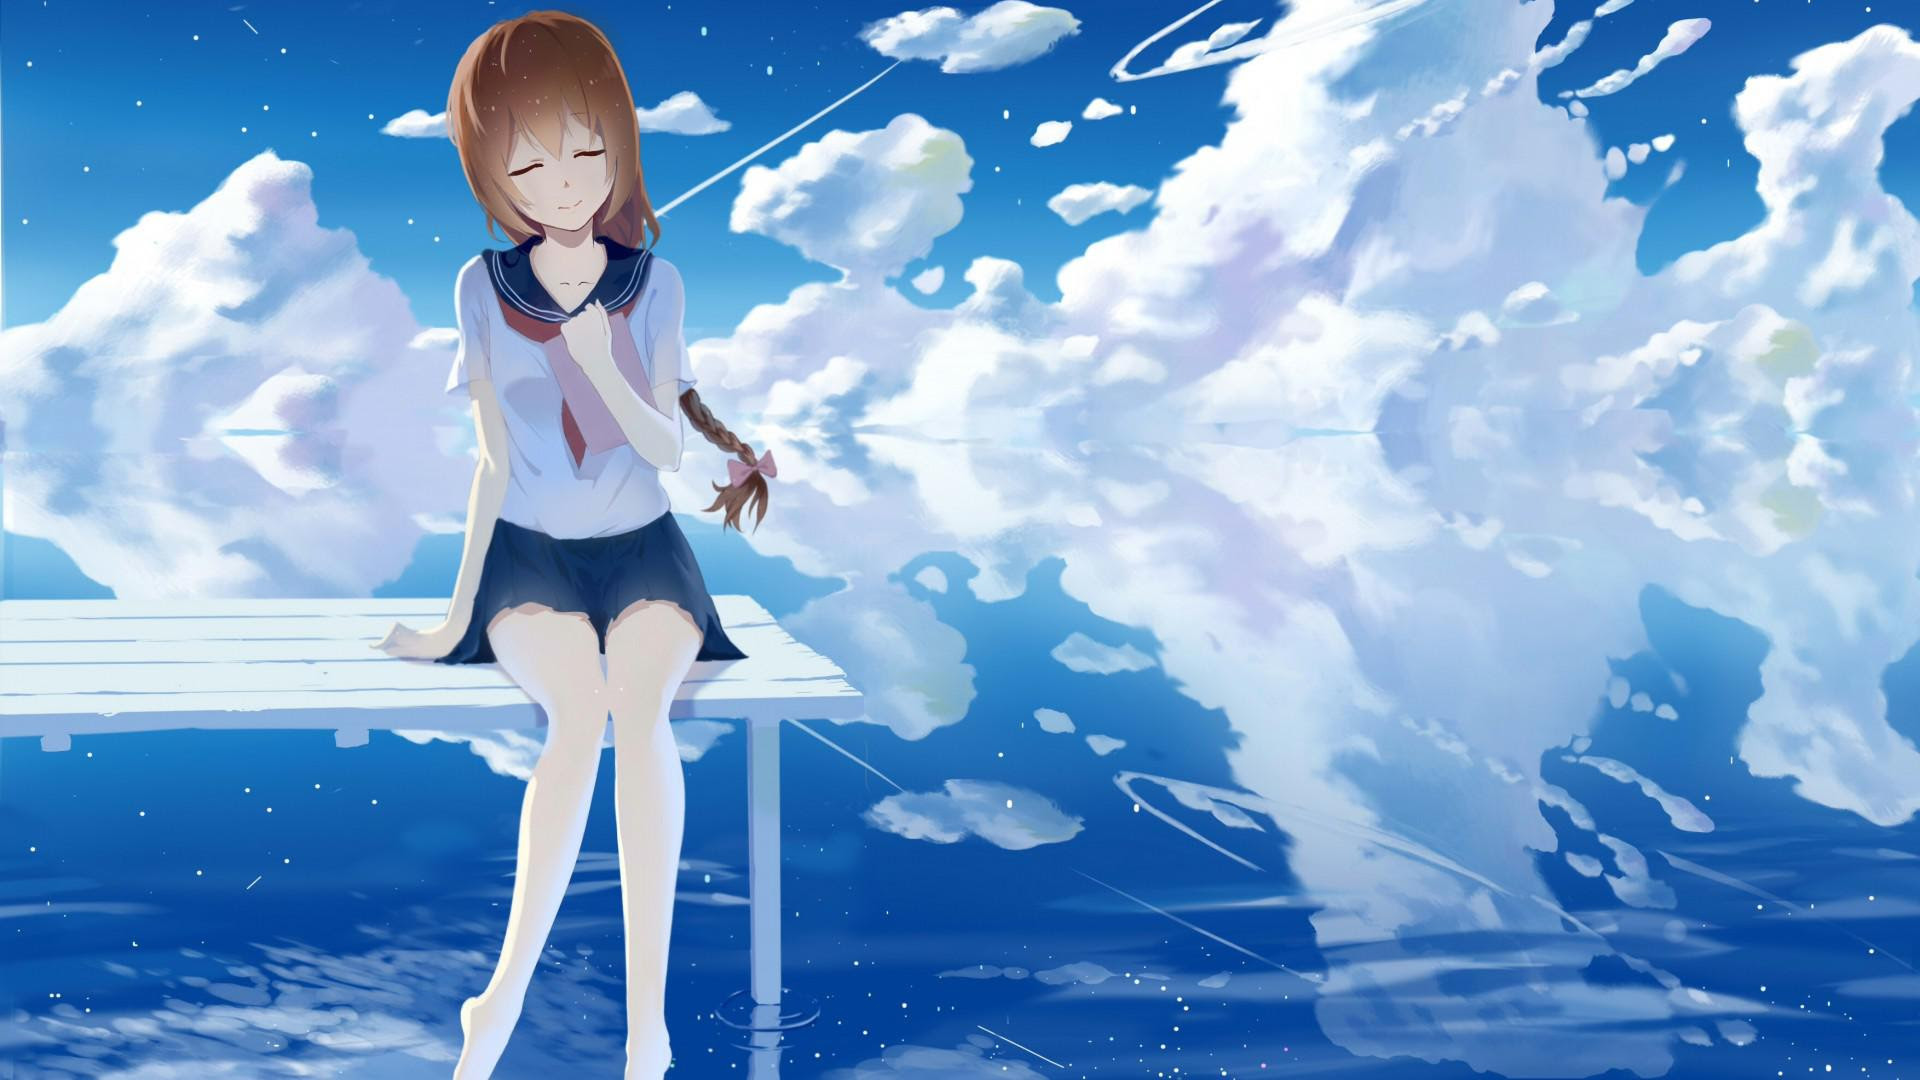 Unduh 2000 Wallpaper Anime Hd HD Paling Keren